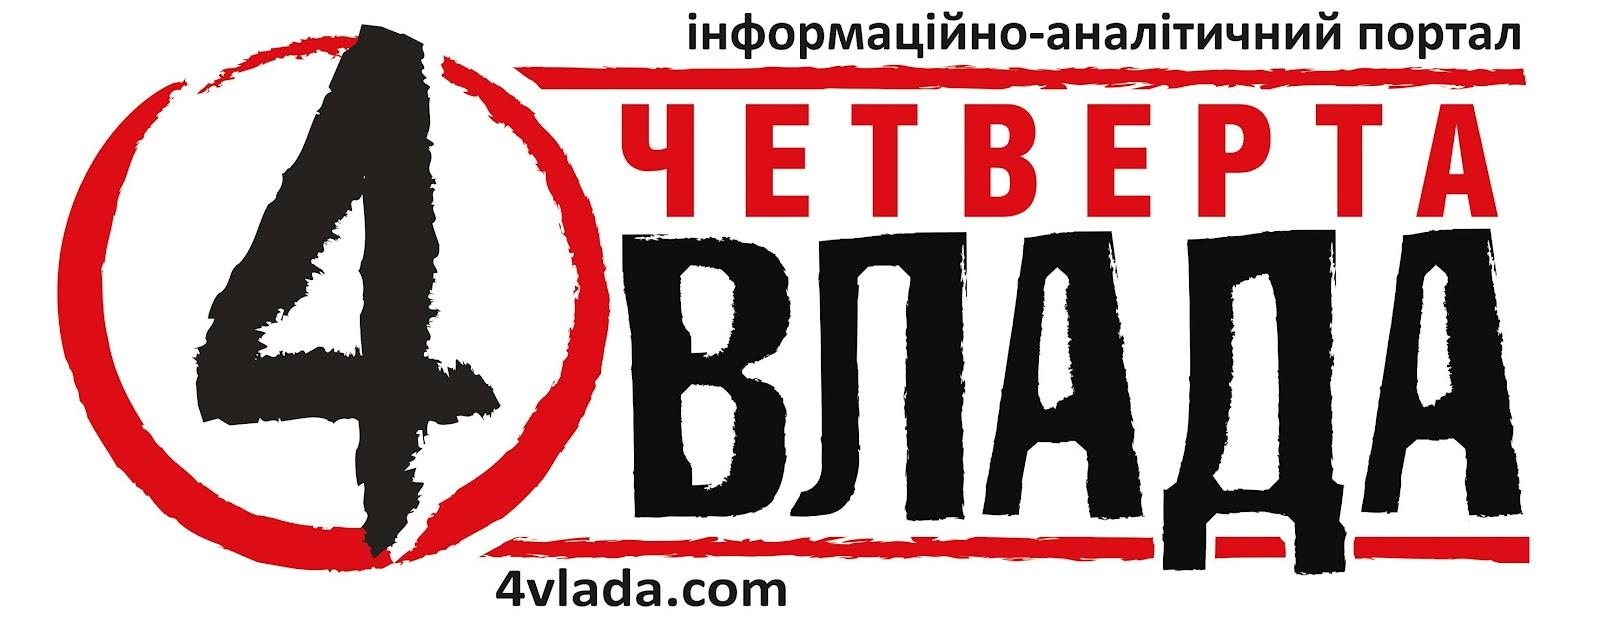 D:\Download\!BANERY\Logotypy\4vlada-logo-goryzont-white-notsmall.jpg